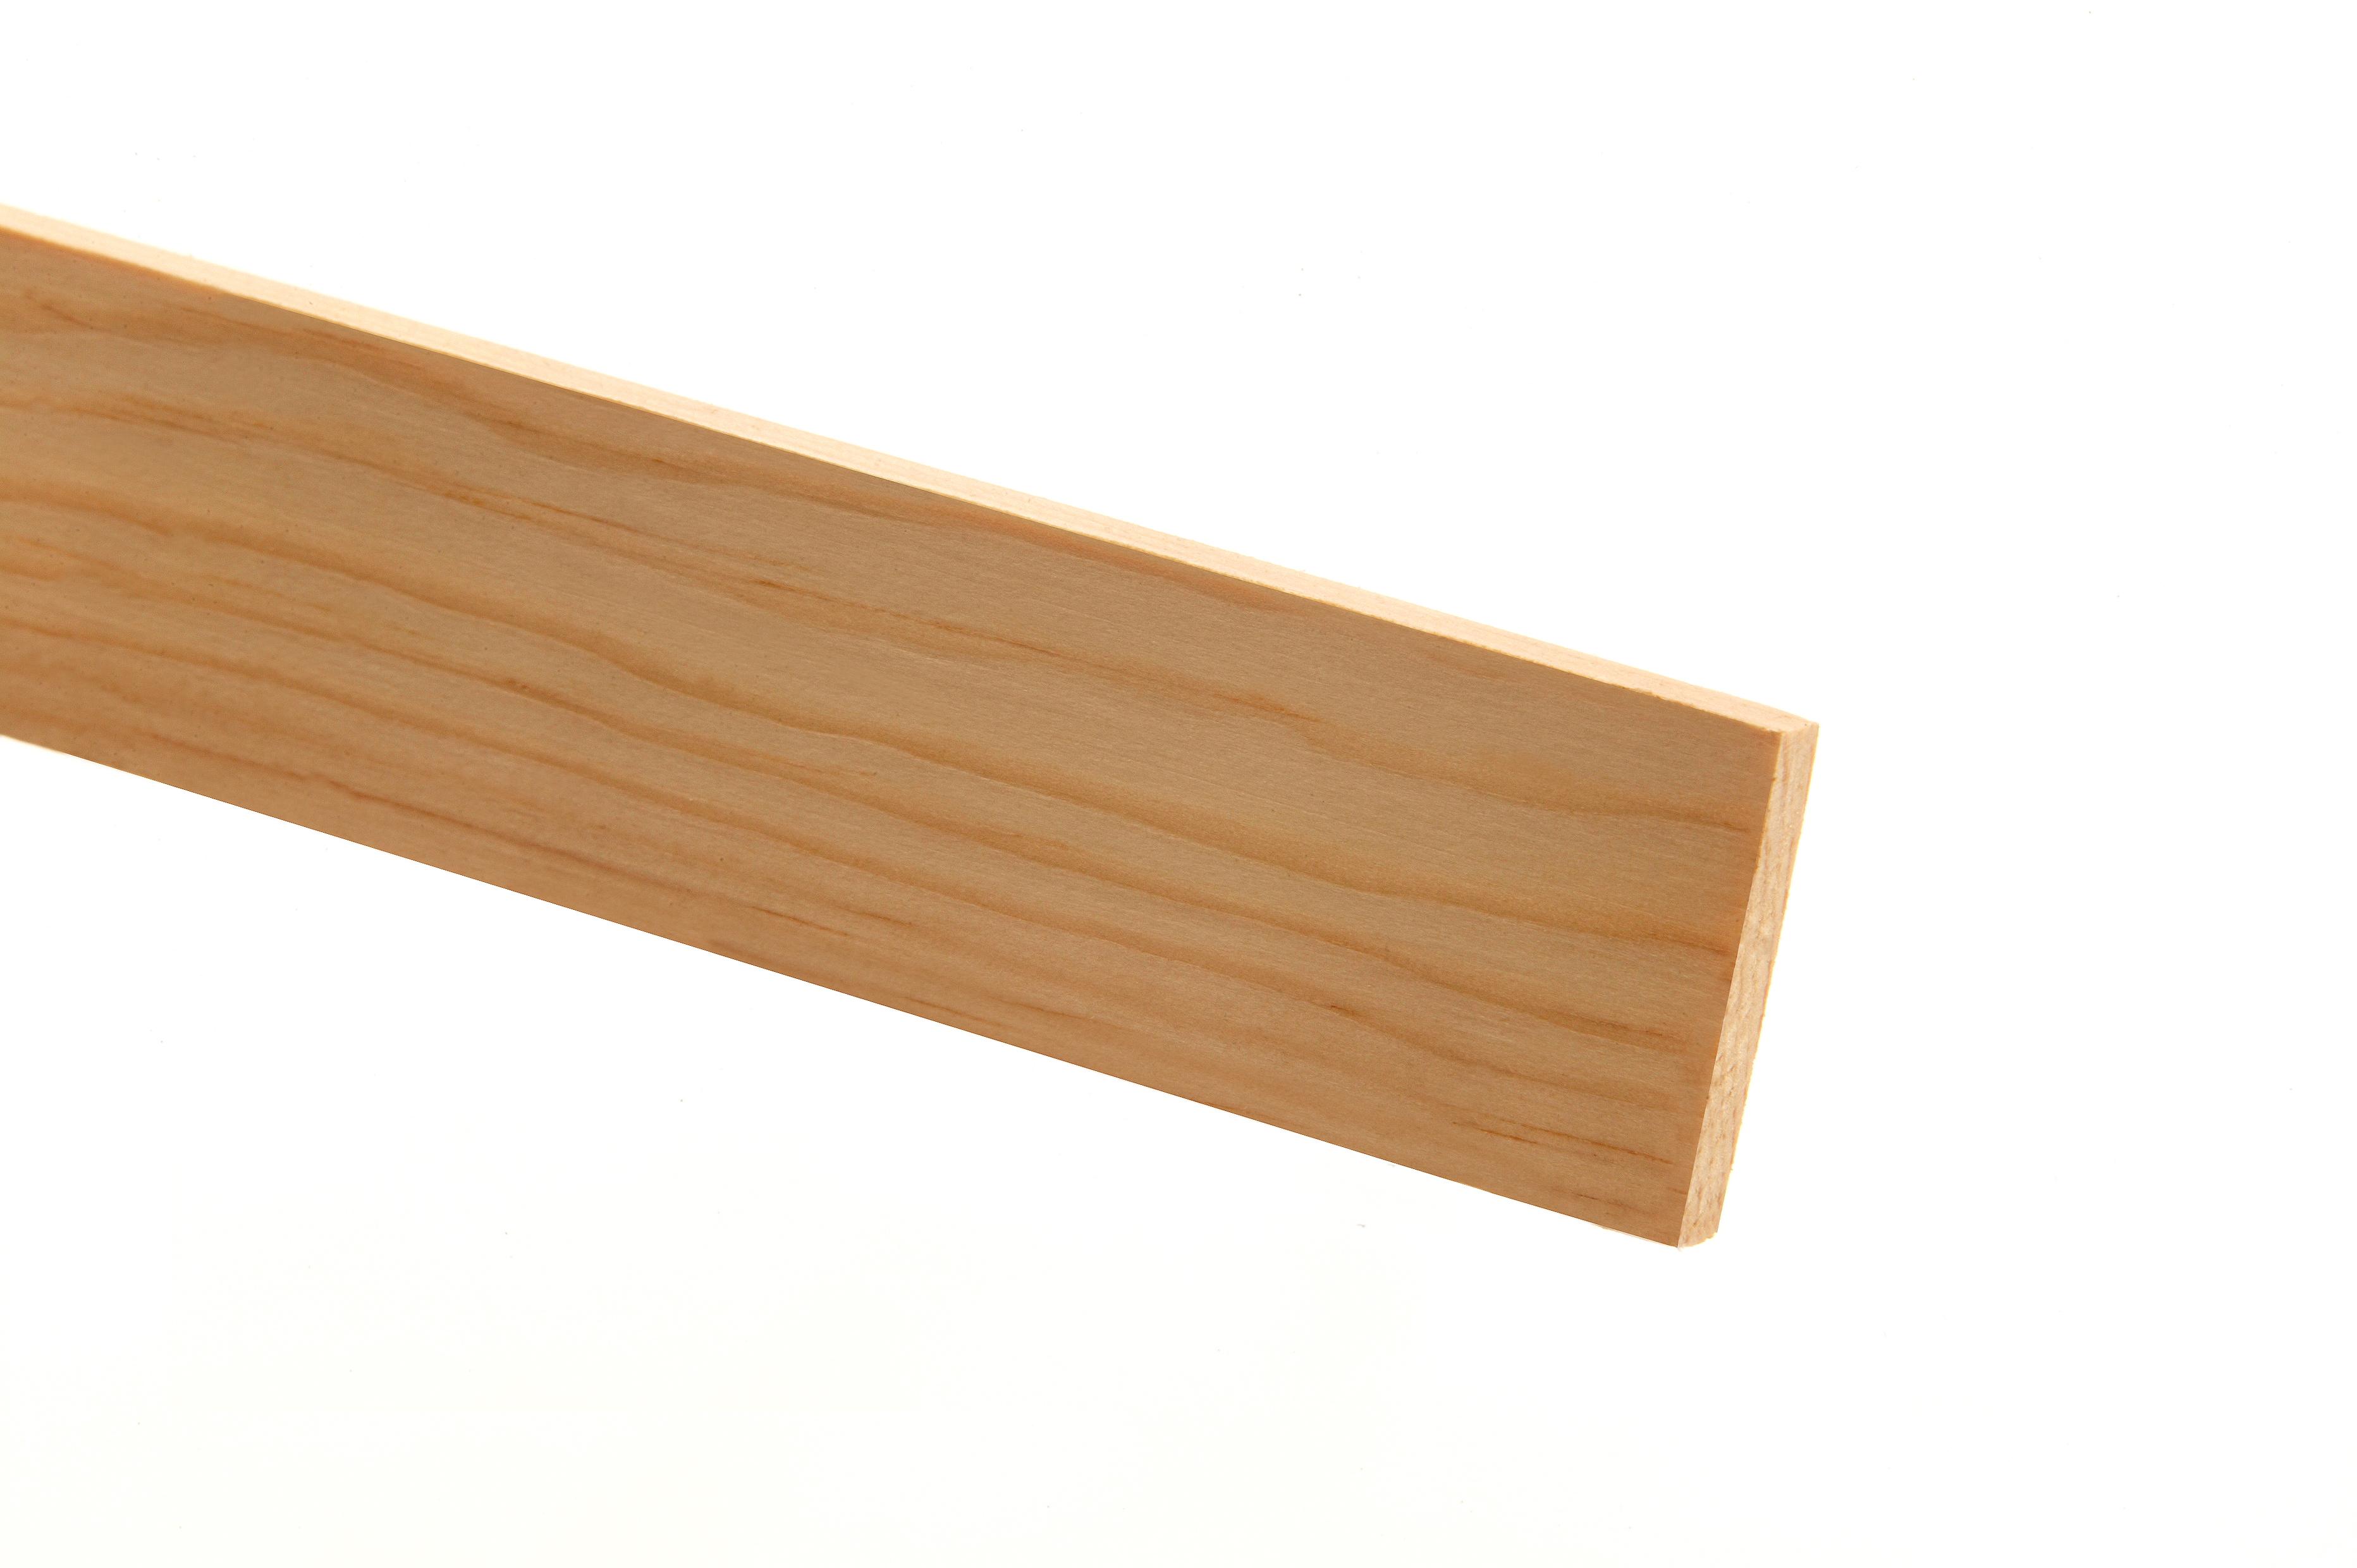 20 Pine PSE Stripwood 4 x 36 x 2400mm